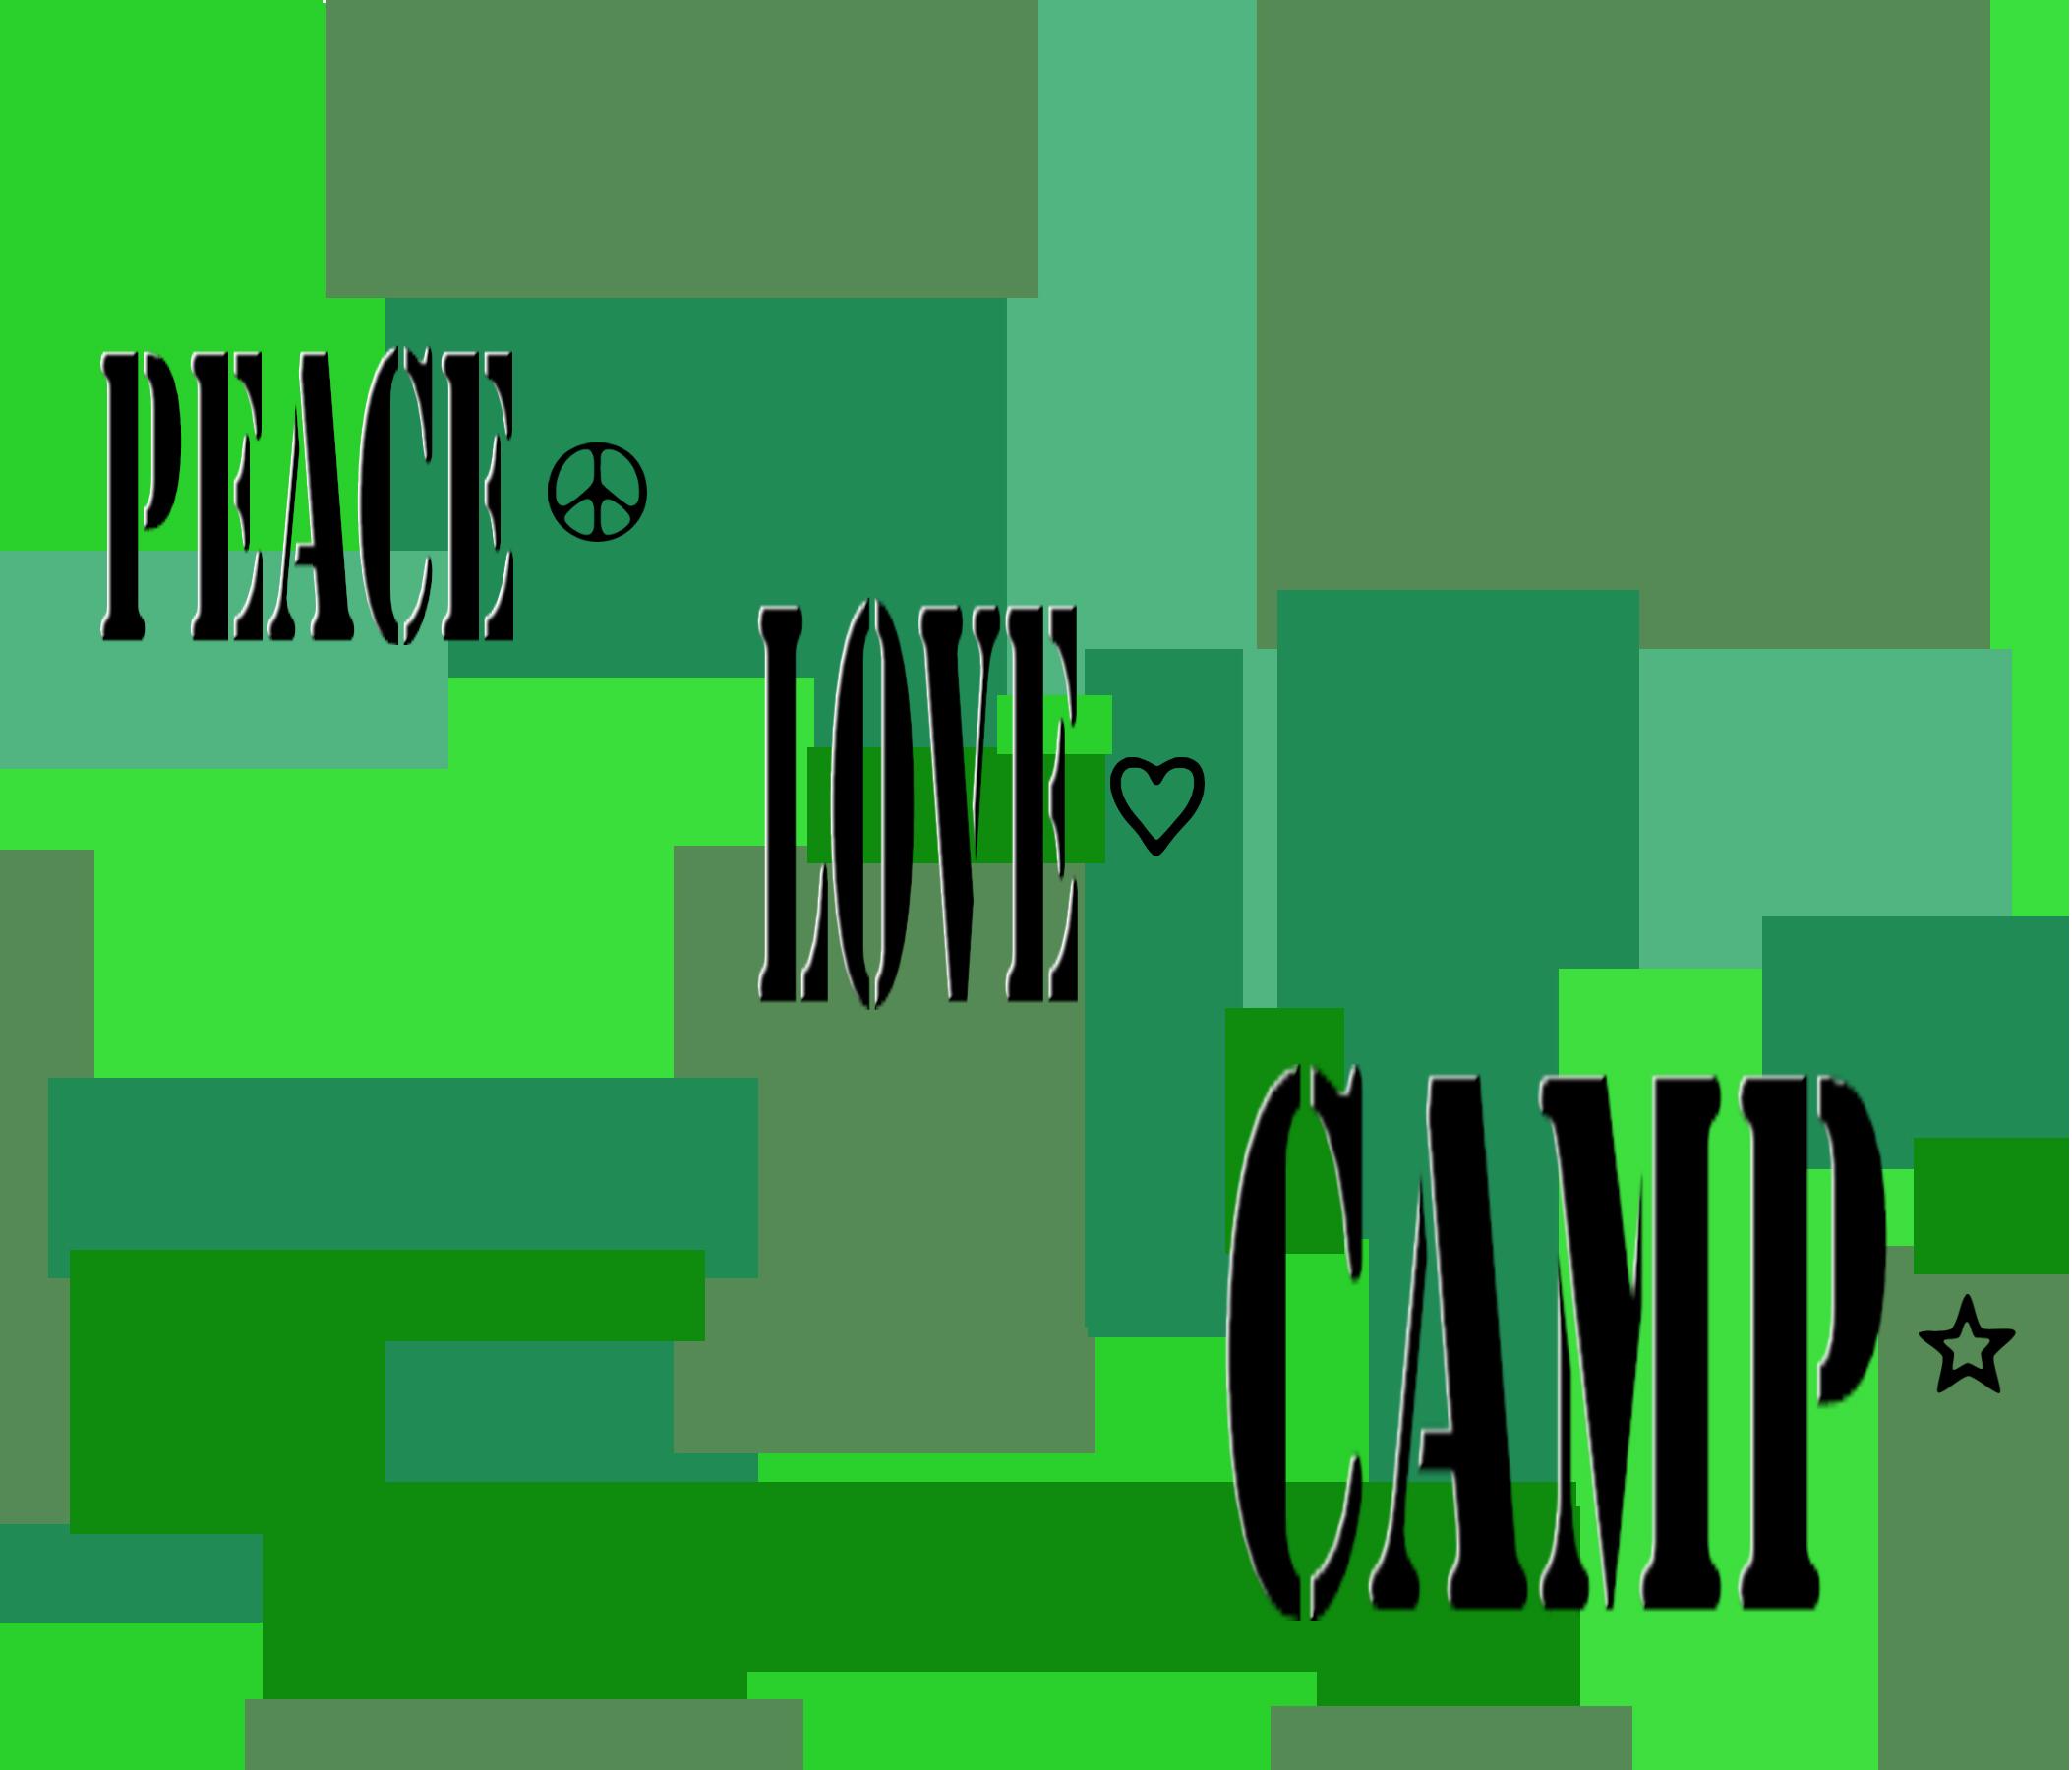 PEACE...LOVE...CAMP (3)